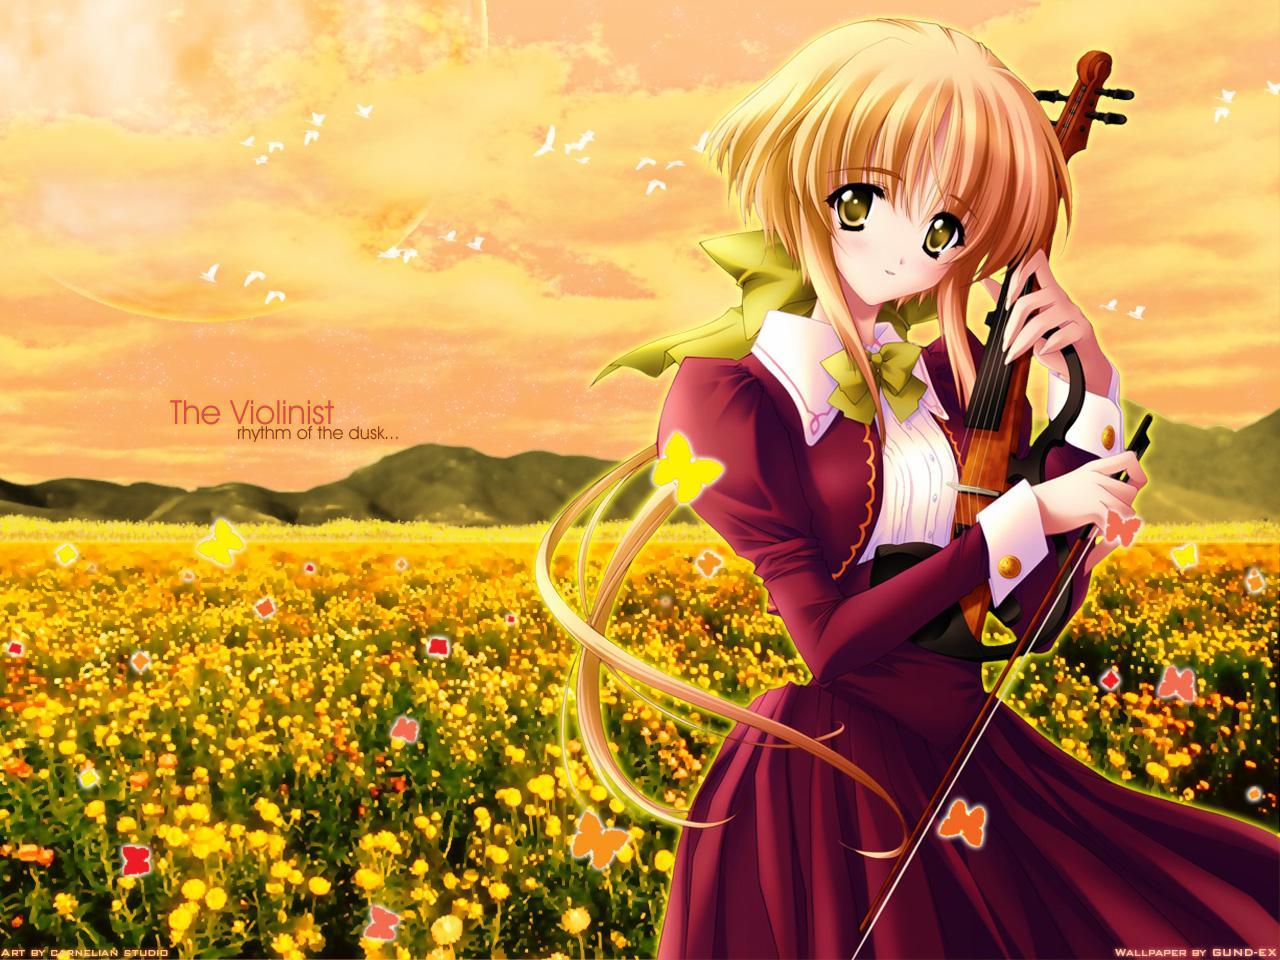 http://2.bp.blogspot.com/_61v7UyxTmhQ/SaagcRZERwI/AAAAAAAAAVA/C3cQF-s8kis/S1600-R/anime_wallpapers-111954492411%5B1%5D.jpg